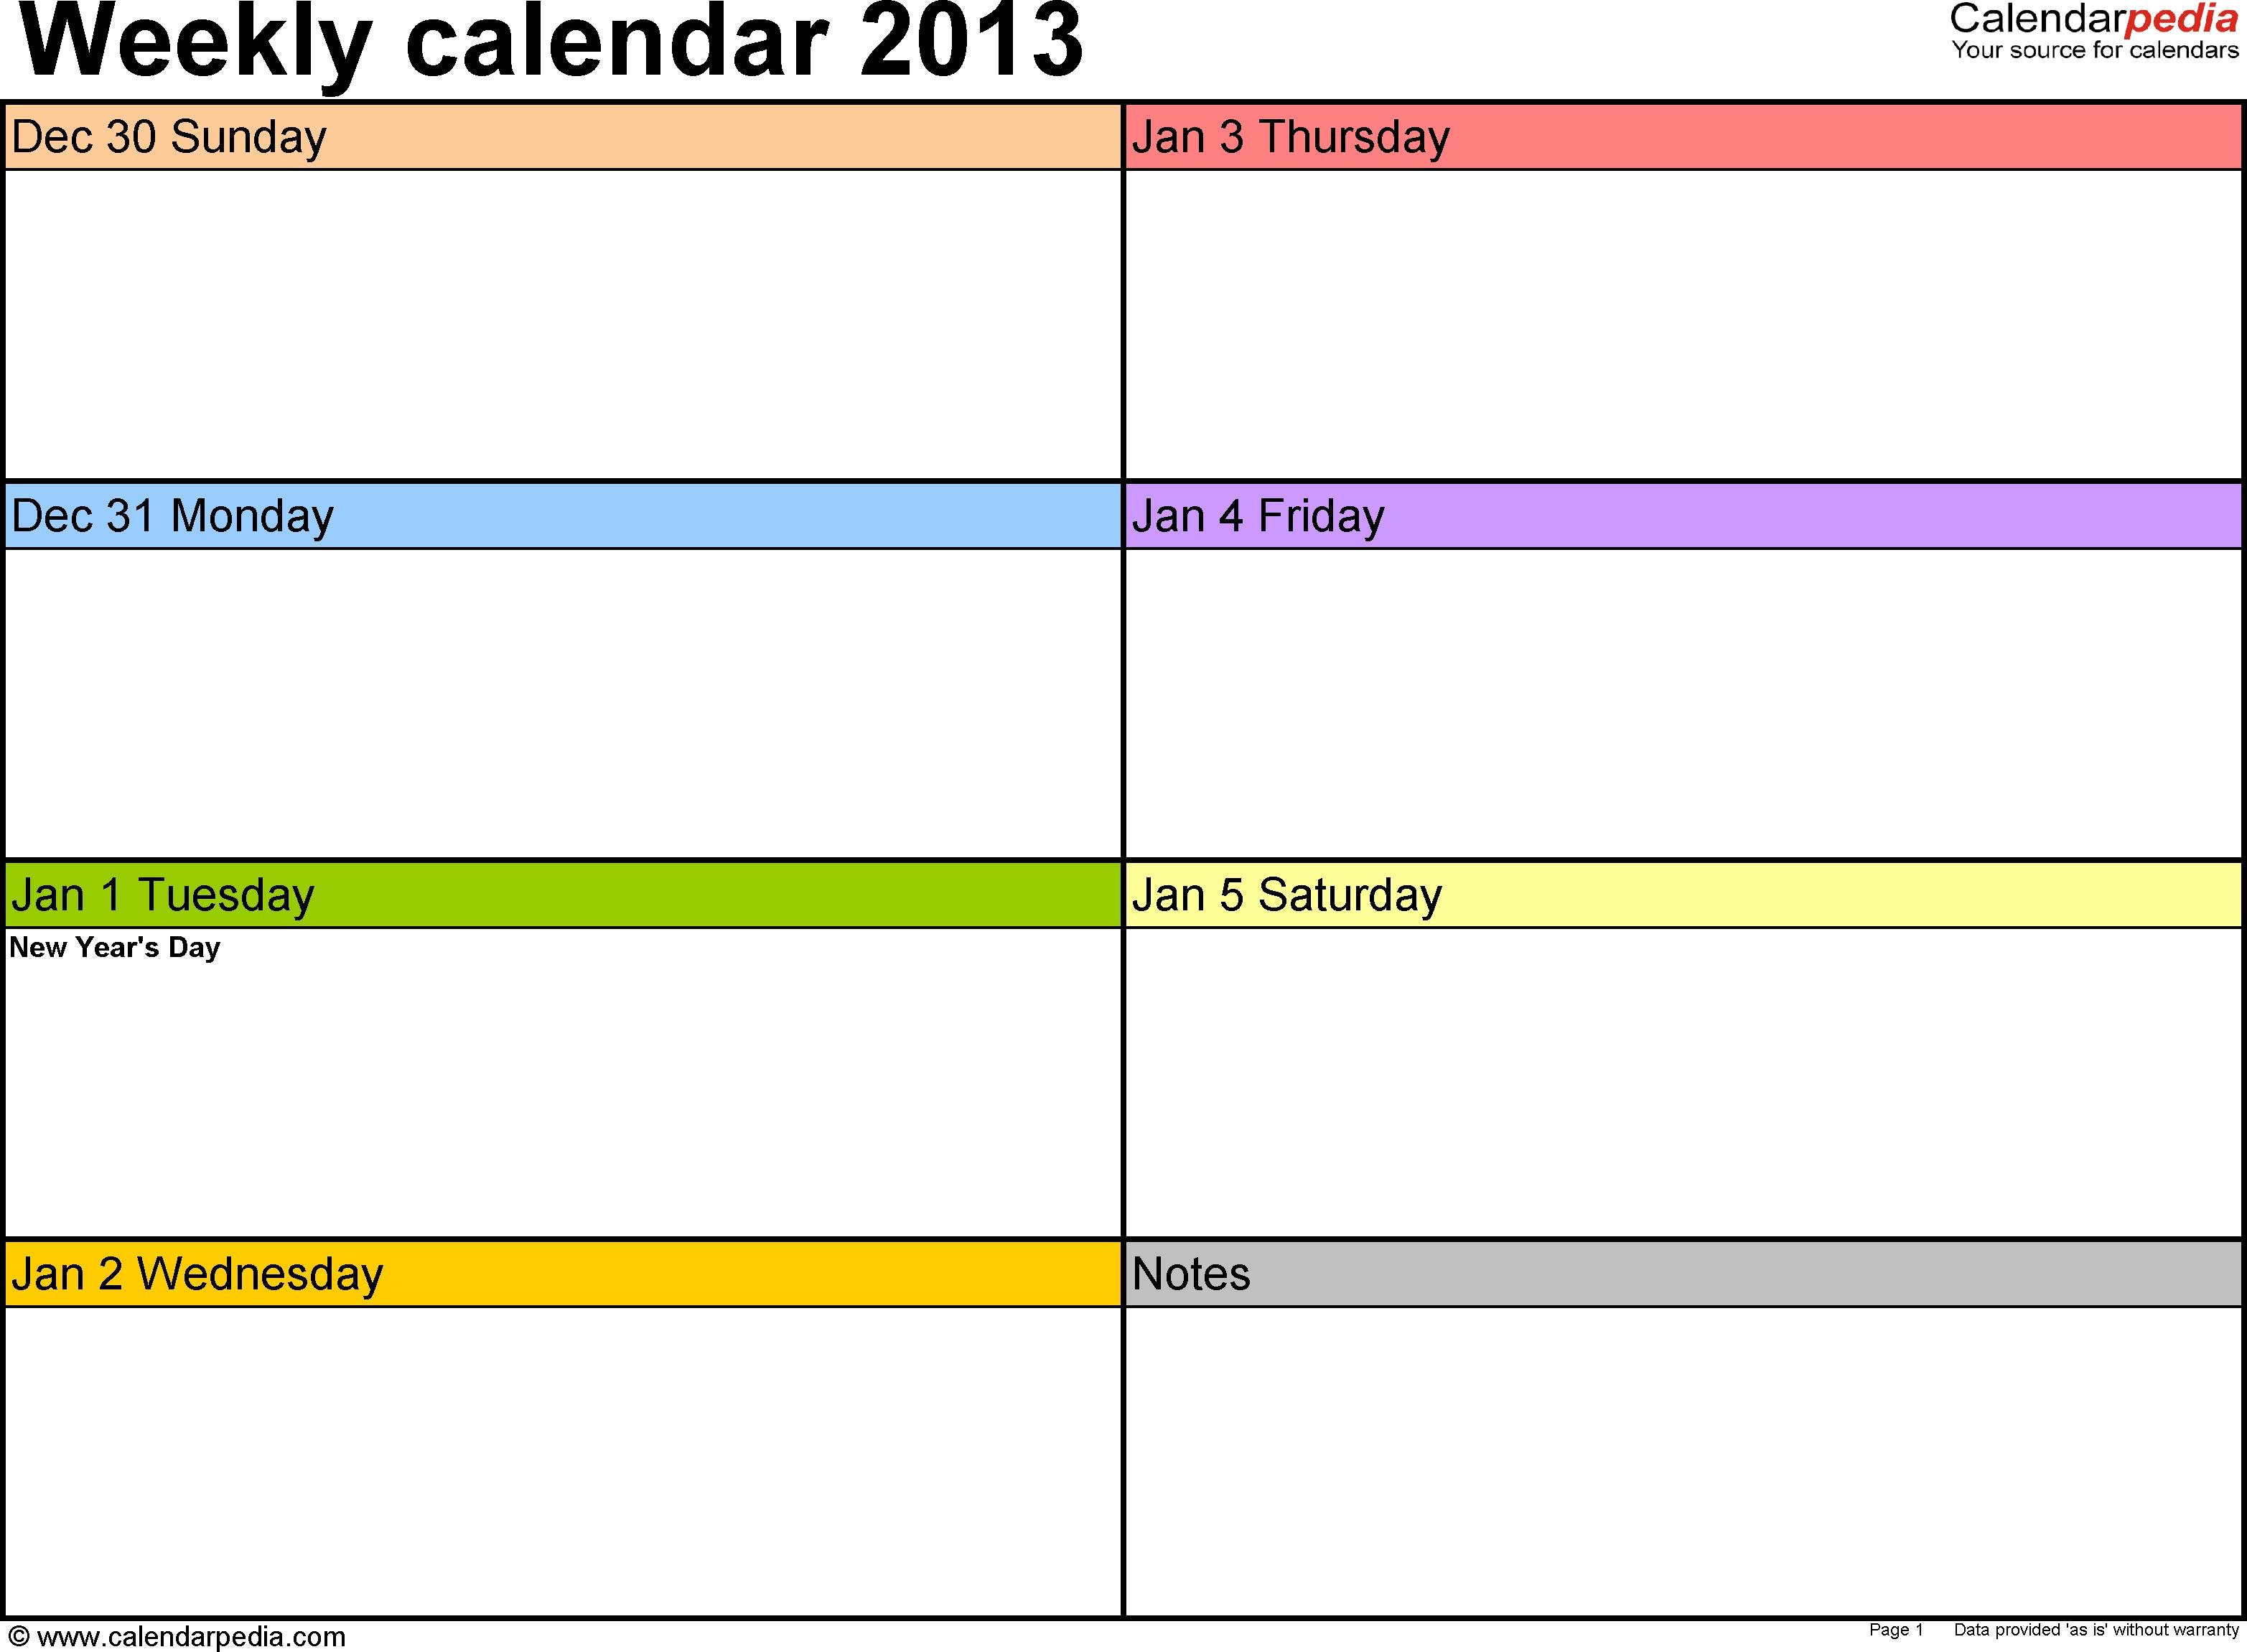 Fillable Daily Agenda Schedule Blank Calendar Planner Template in 7 Day Calendar Template Fillable